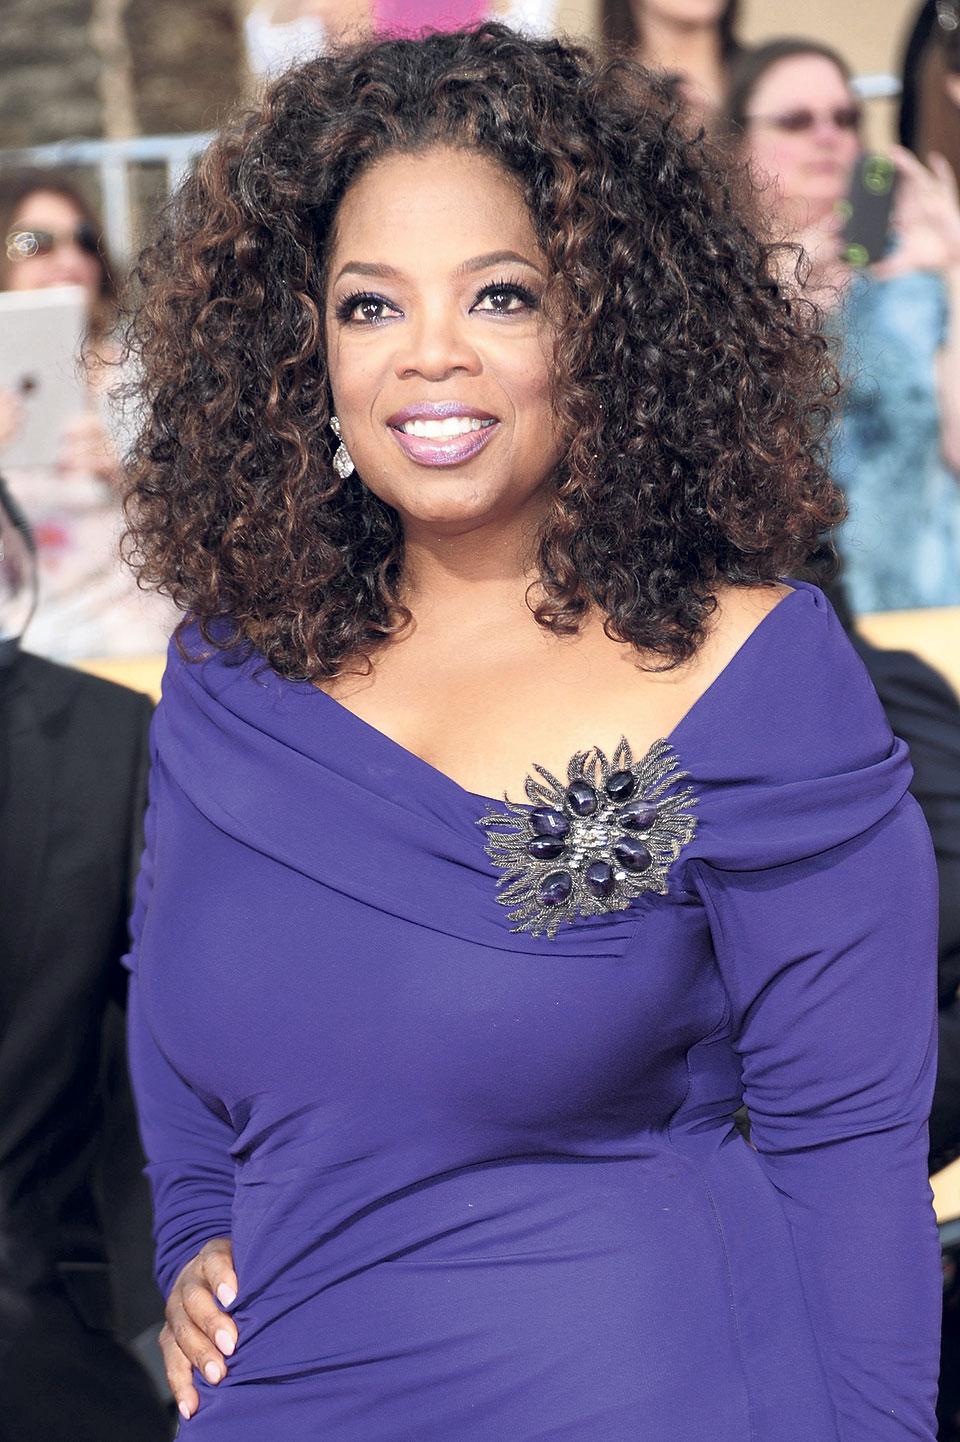 Oprah takes on Trump-era political divide in a show